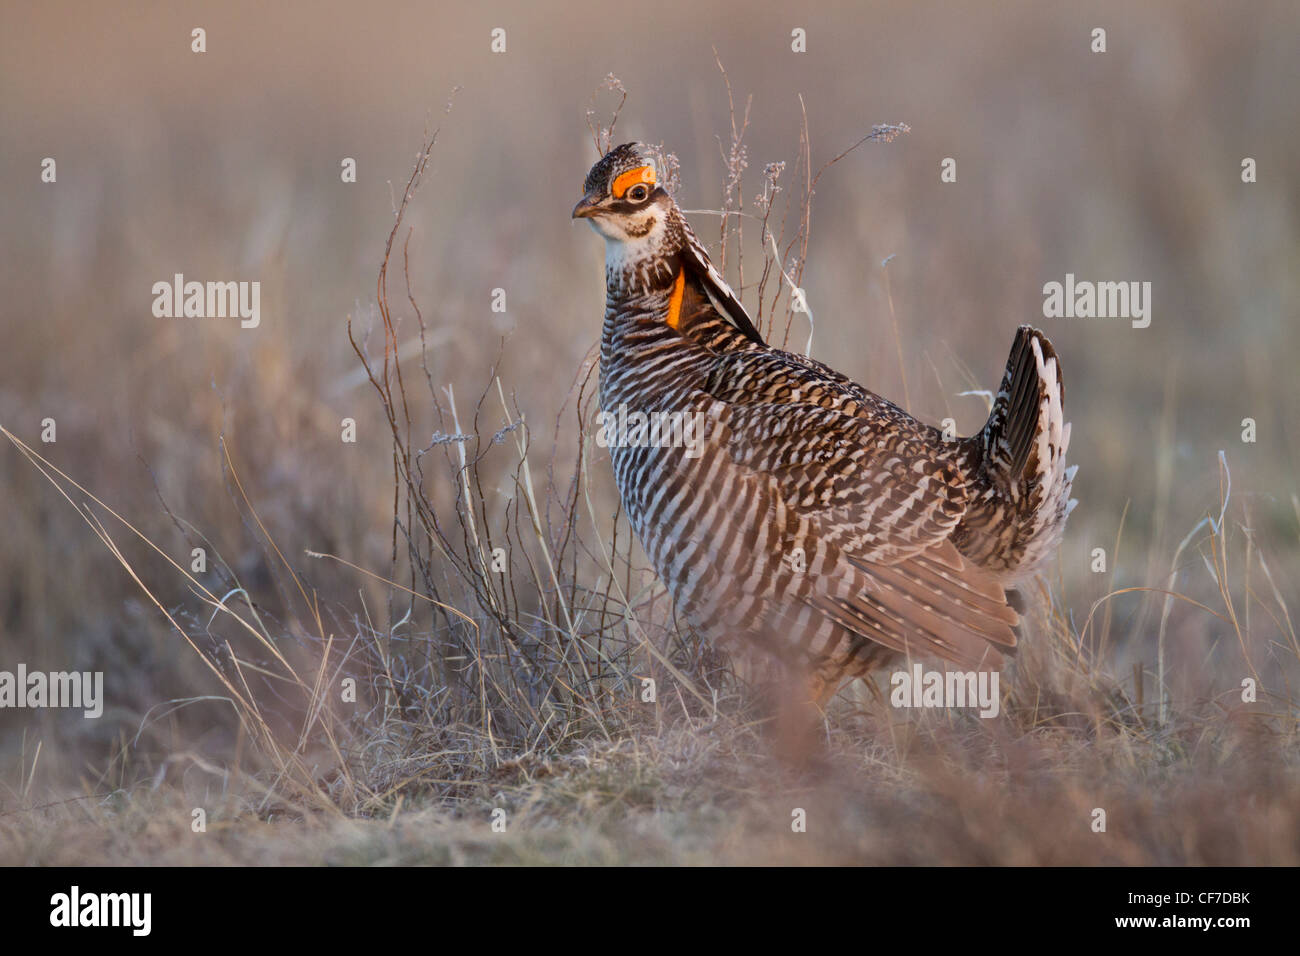 Male greater prairie chicken on lek in spring - Stock Image